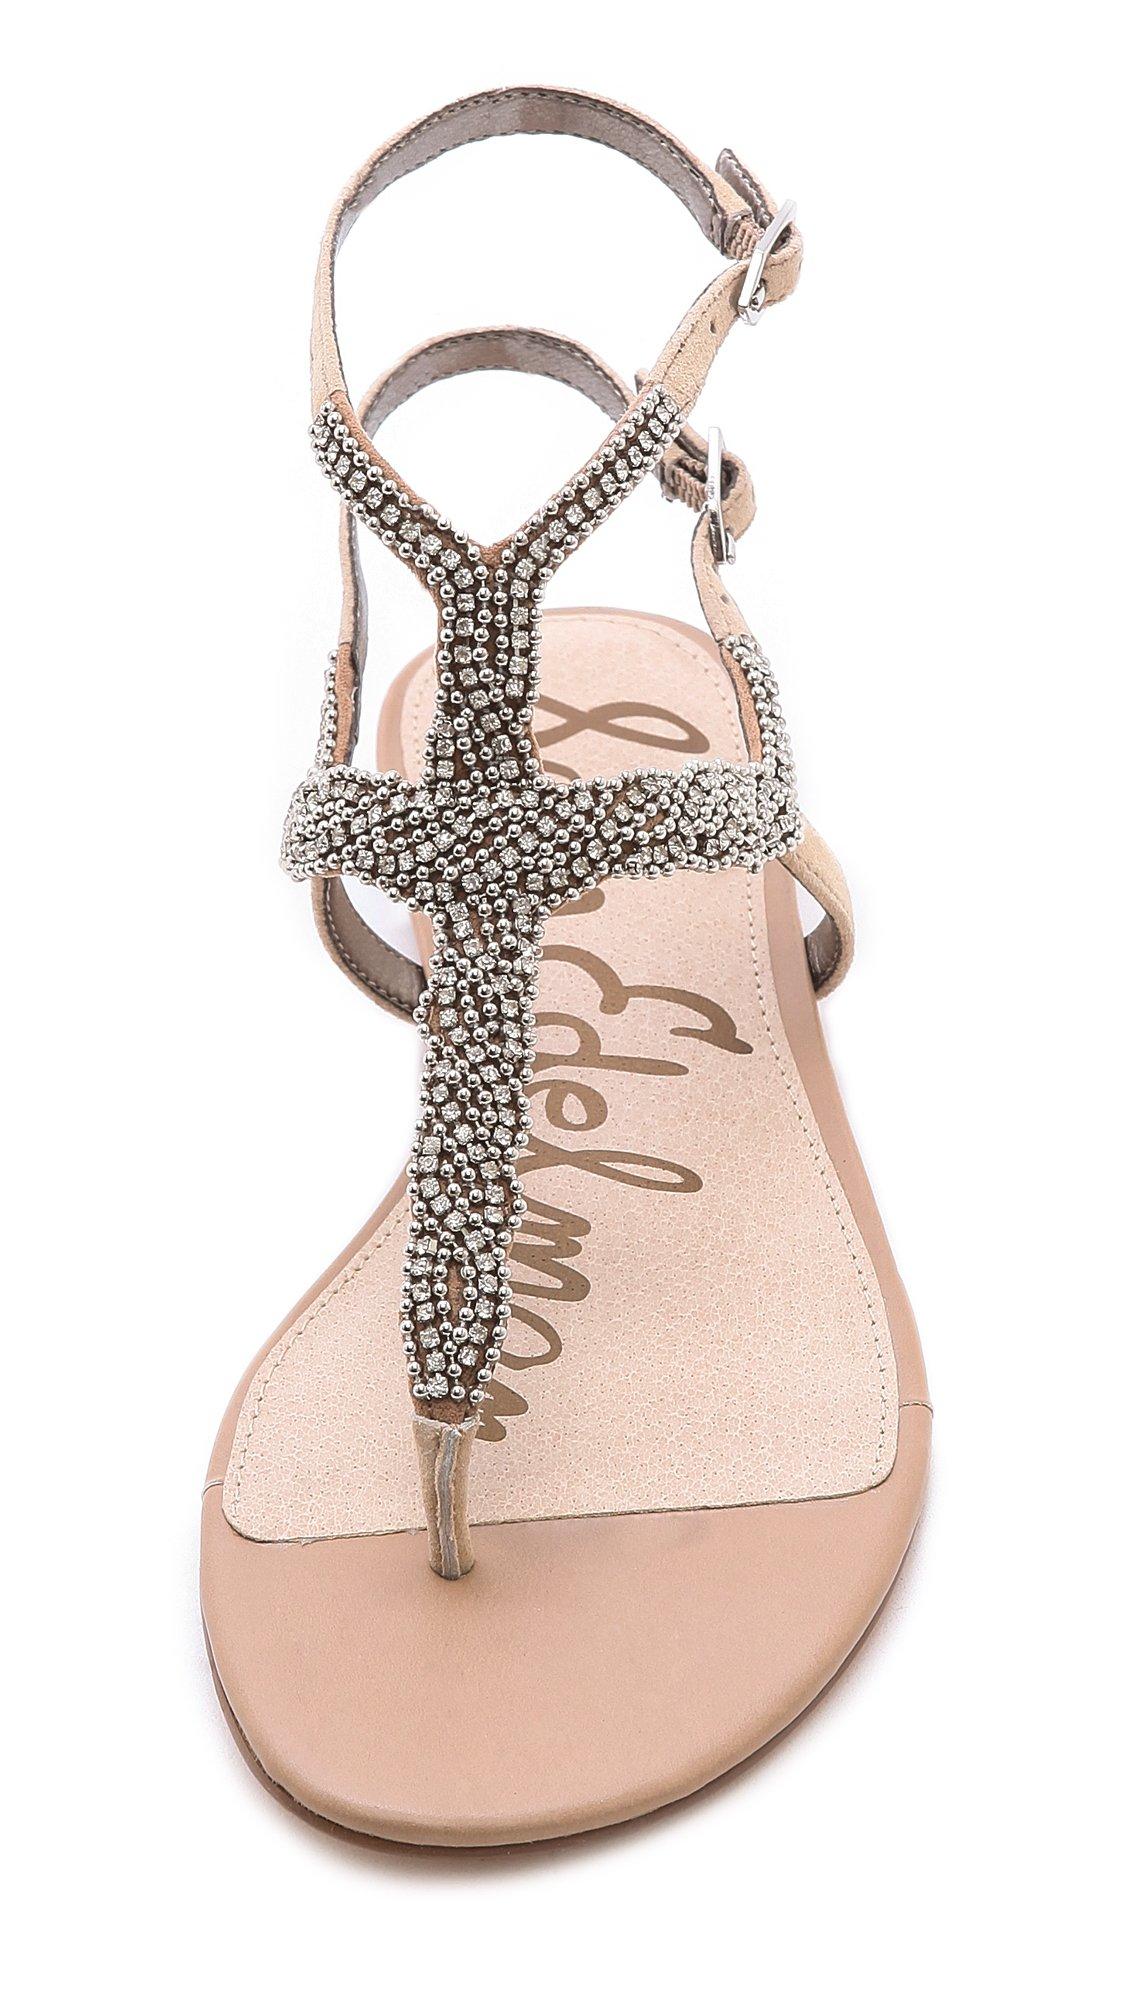 1944faa4fe6c Lyst - Sam Edelman Nahara Jeweled Sandals Buff Nude in Brown